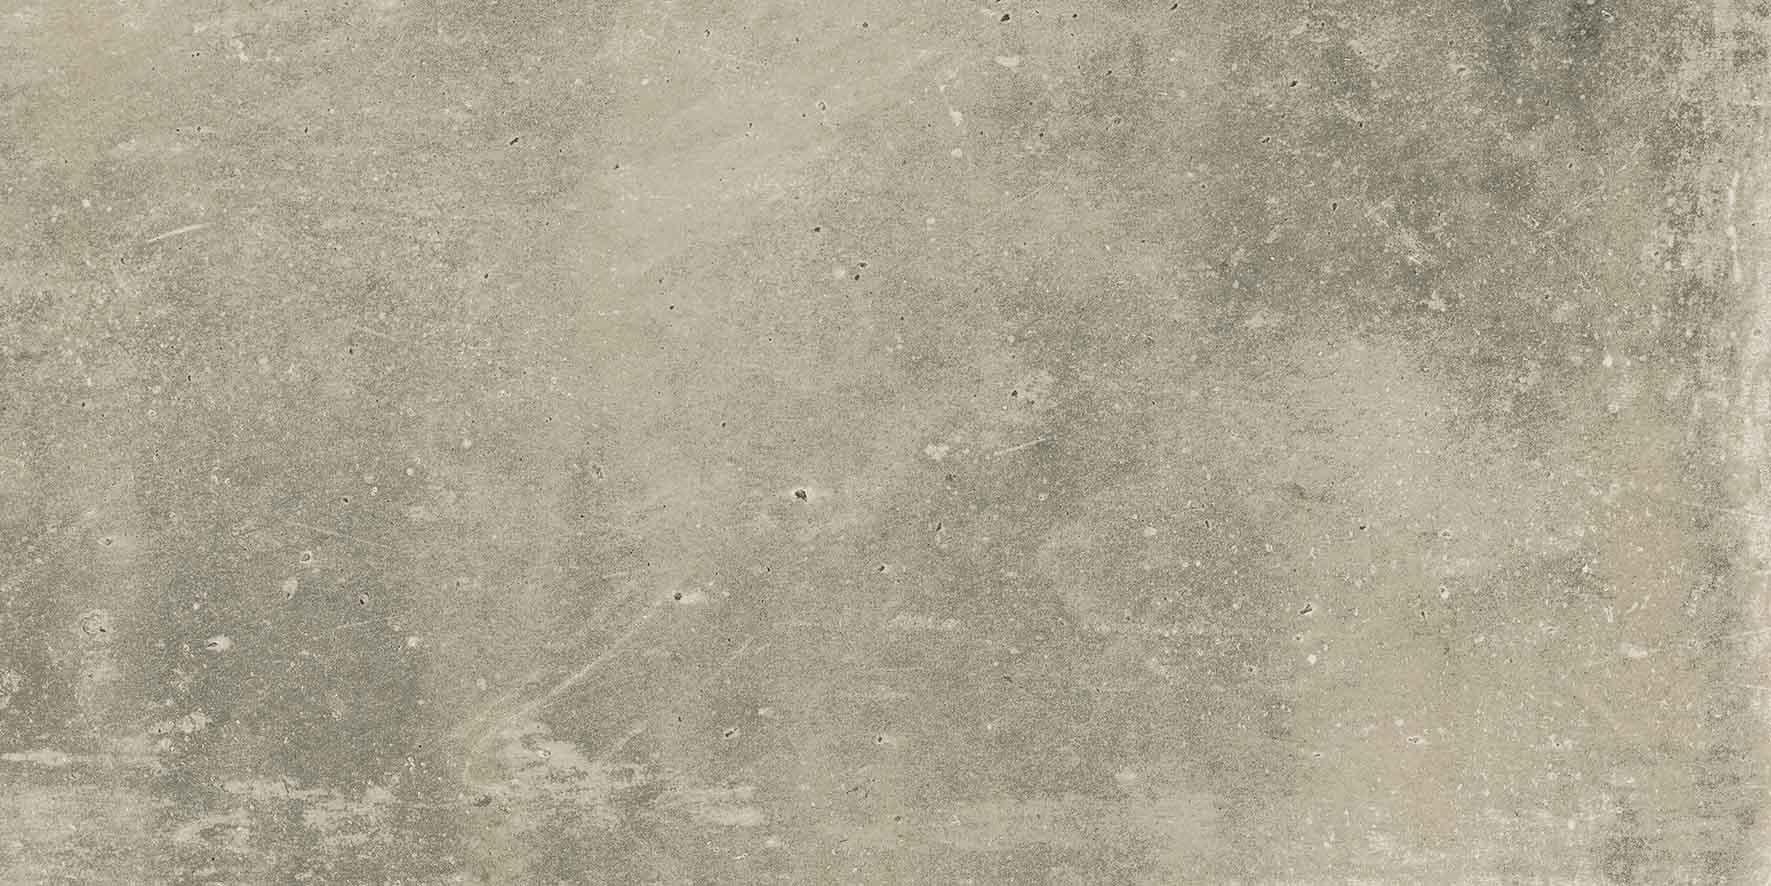 Maps Of Cerim Beige Matte 10mm 30 x 60